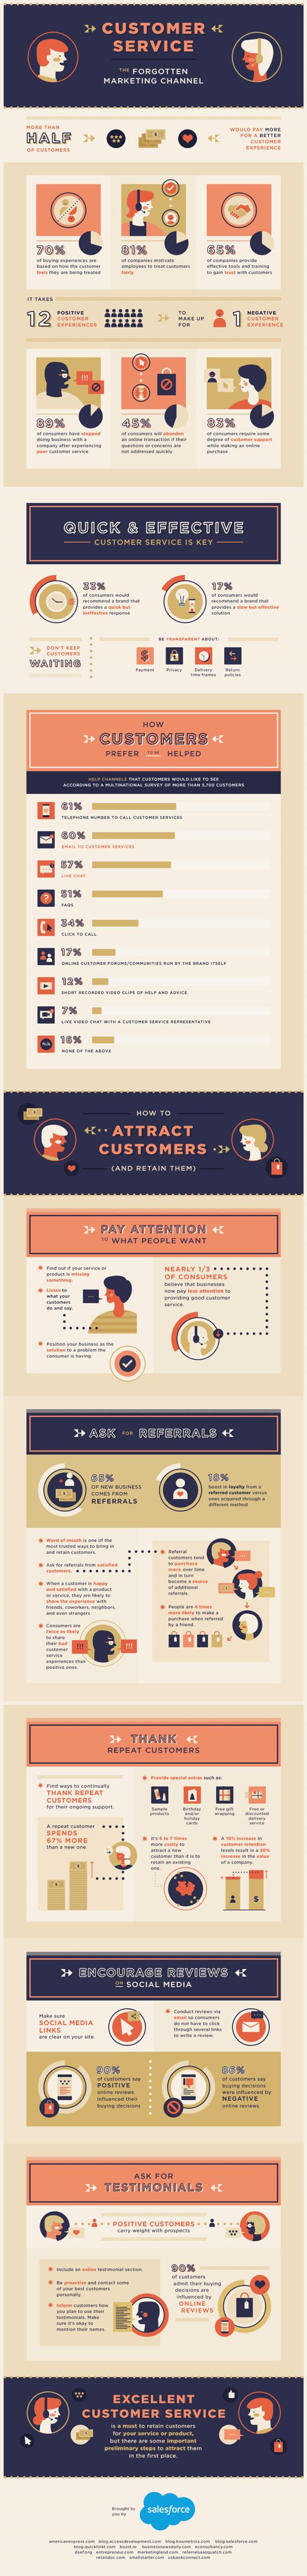 customer service infographic